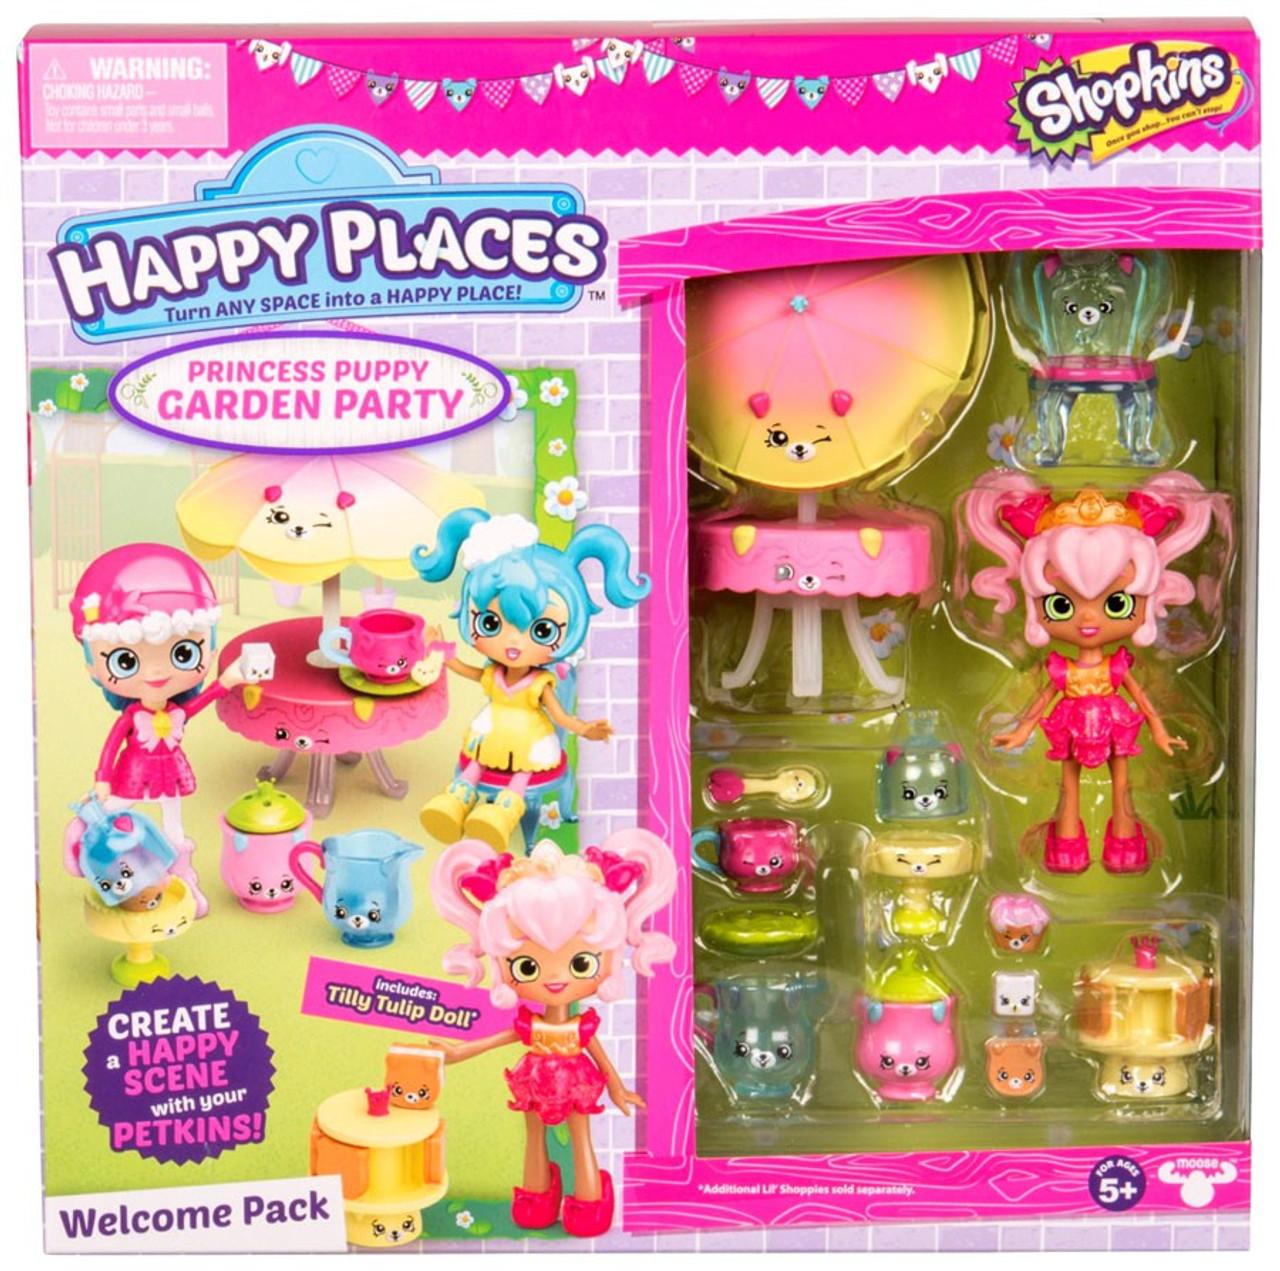 Princess Puppy garden Party Moose Shopkins Happy Places Lil Shoppie Pack Bella Bliss